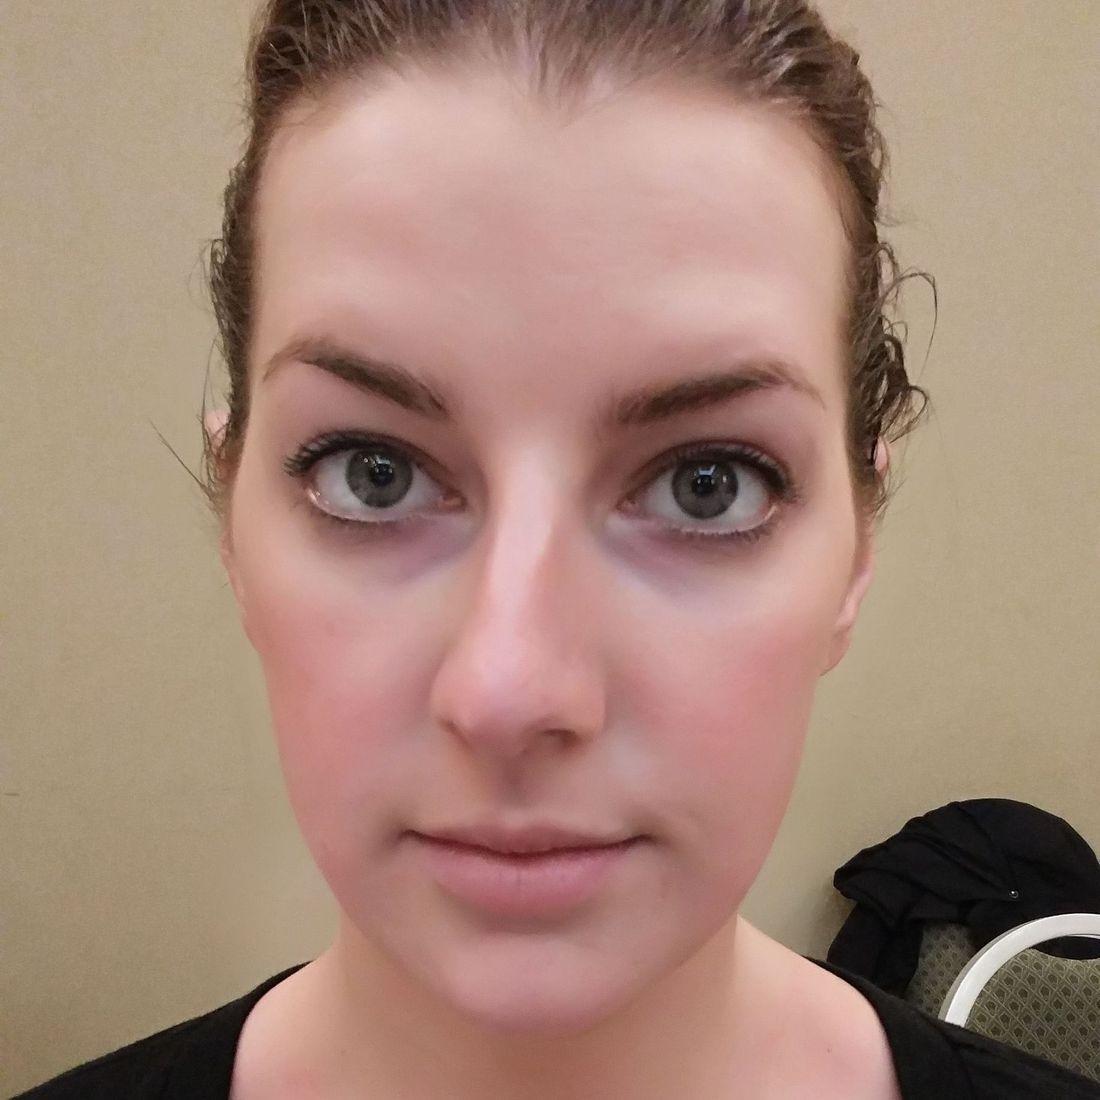 massage rochester best therapist hot stone relief aches Goodman facelift